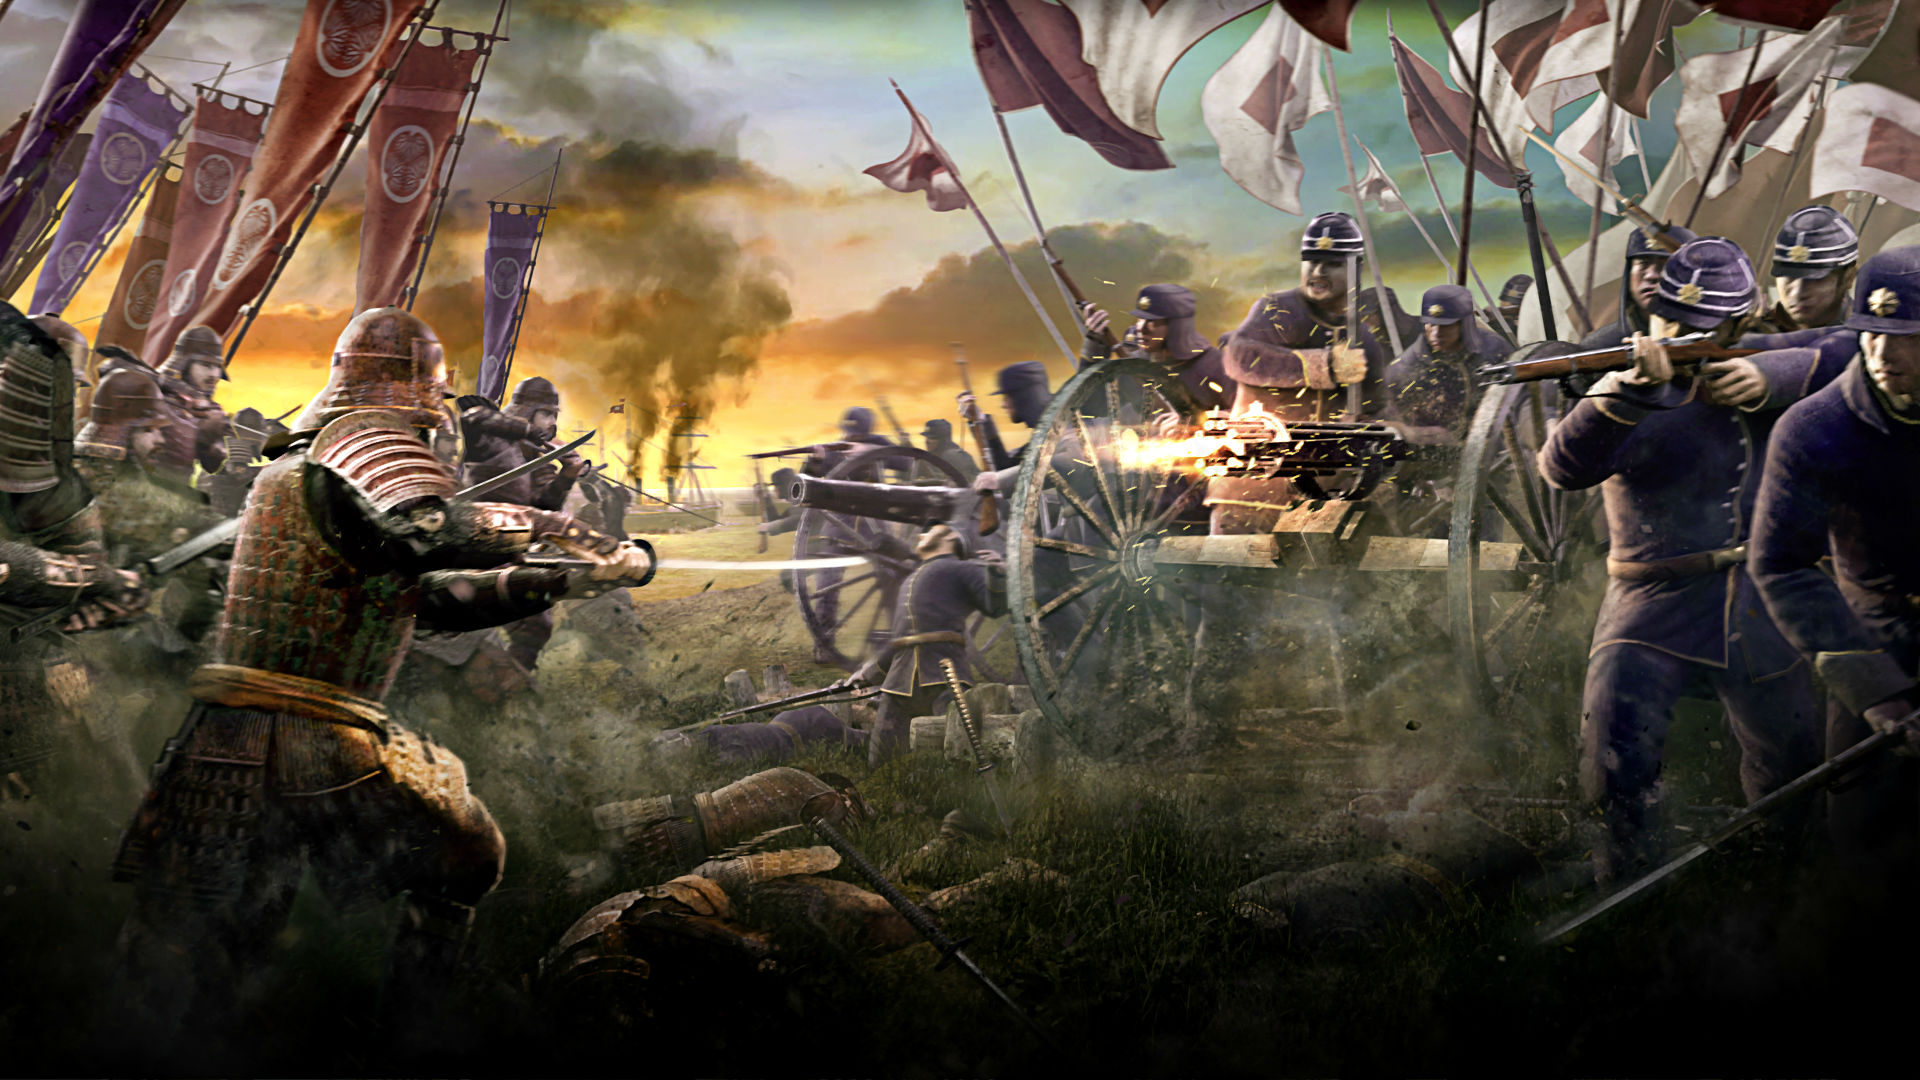 Total War Shogun 2 Fall Of The Samurai Wallpaper Hd Total War Shogun 2 Rise Of The Samurai Fond D 233 Cran Hd